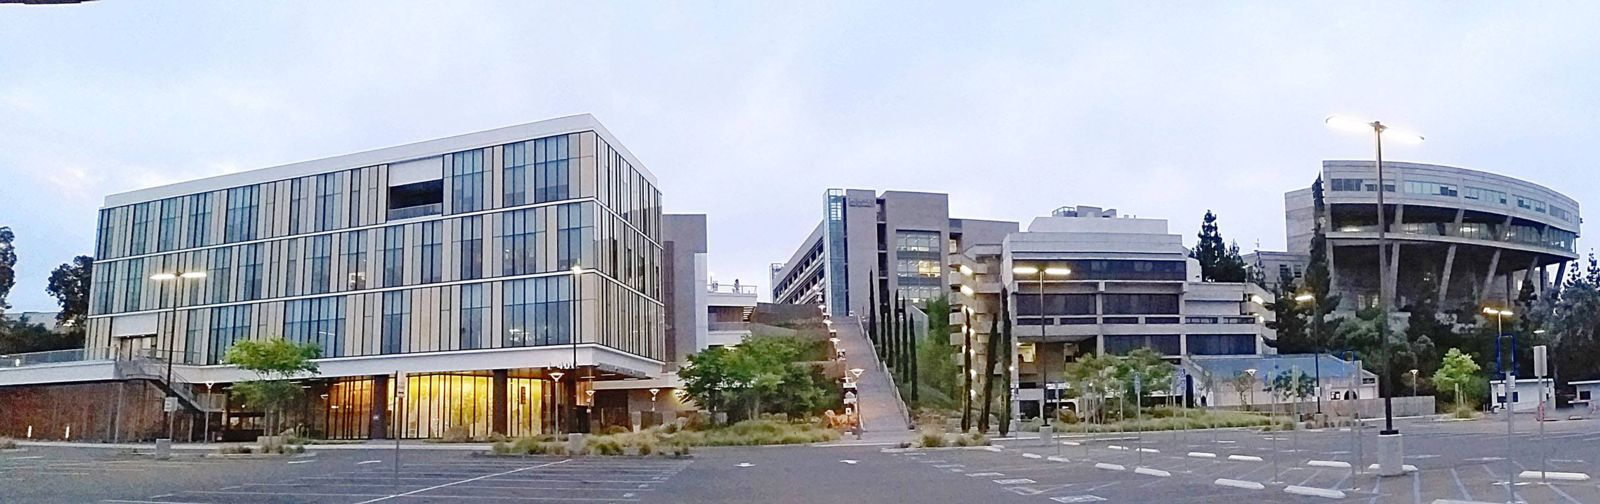 Program Review San Diego Mesa College